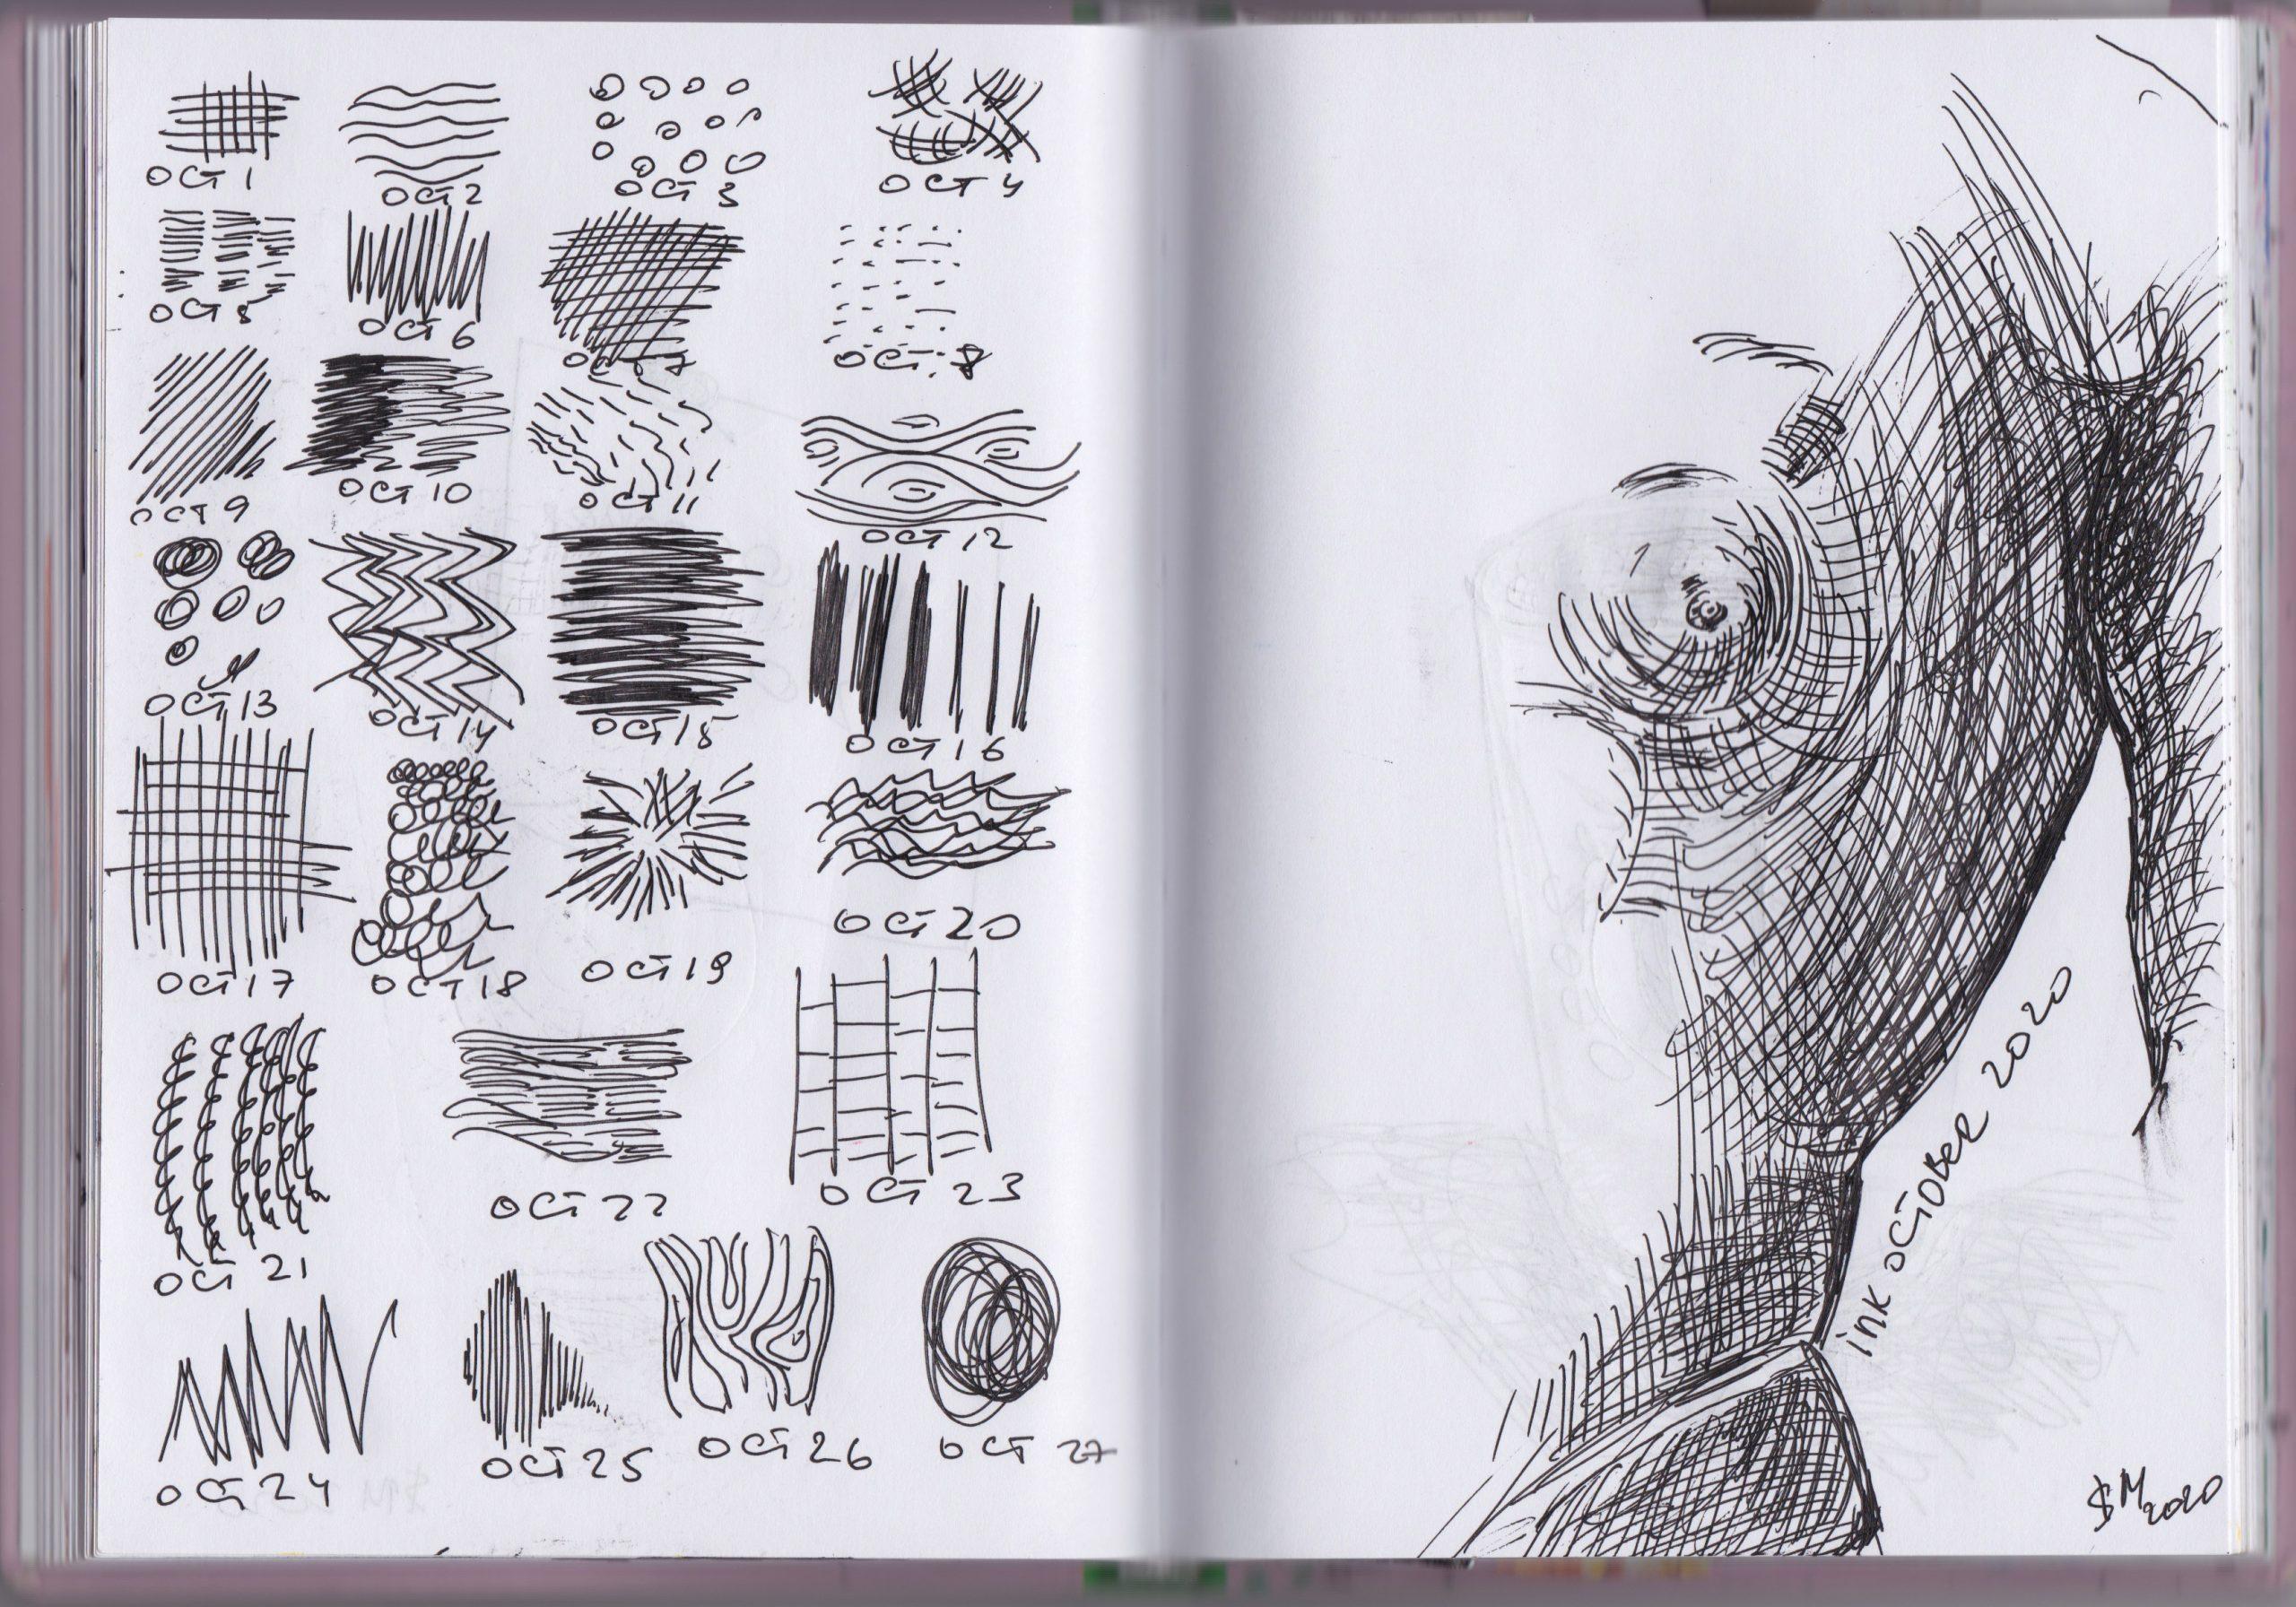 Art journal \ sketches  \ 10 way to Improve your sketchbook